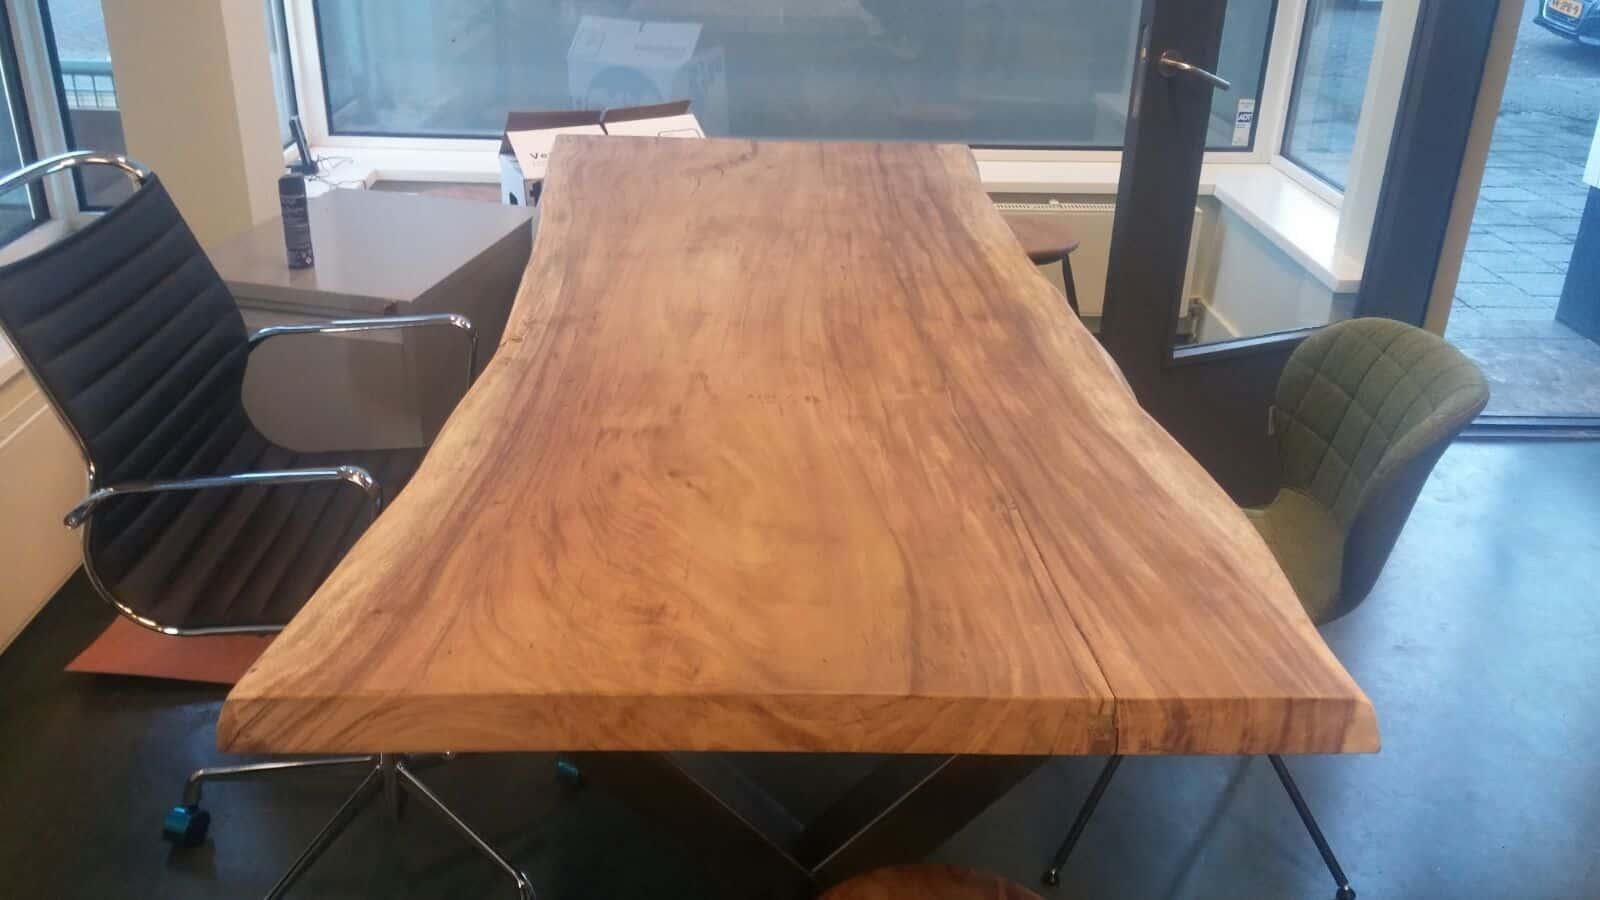 Boomstamtafel  In alle breedtes en lengtes  Woodindustries